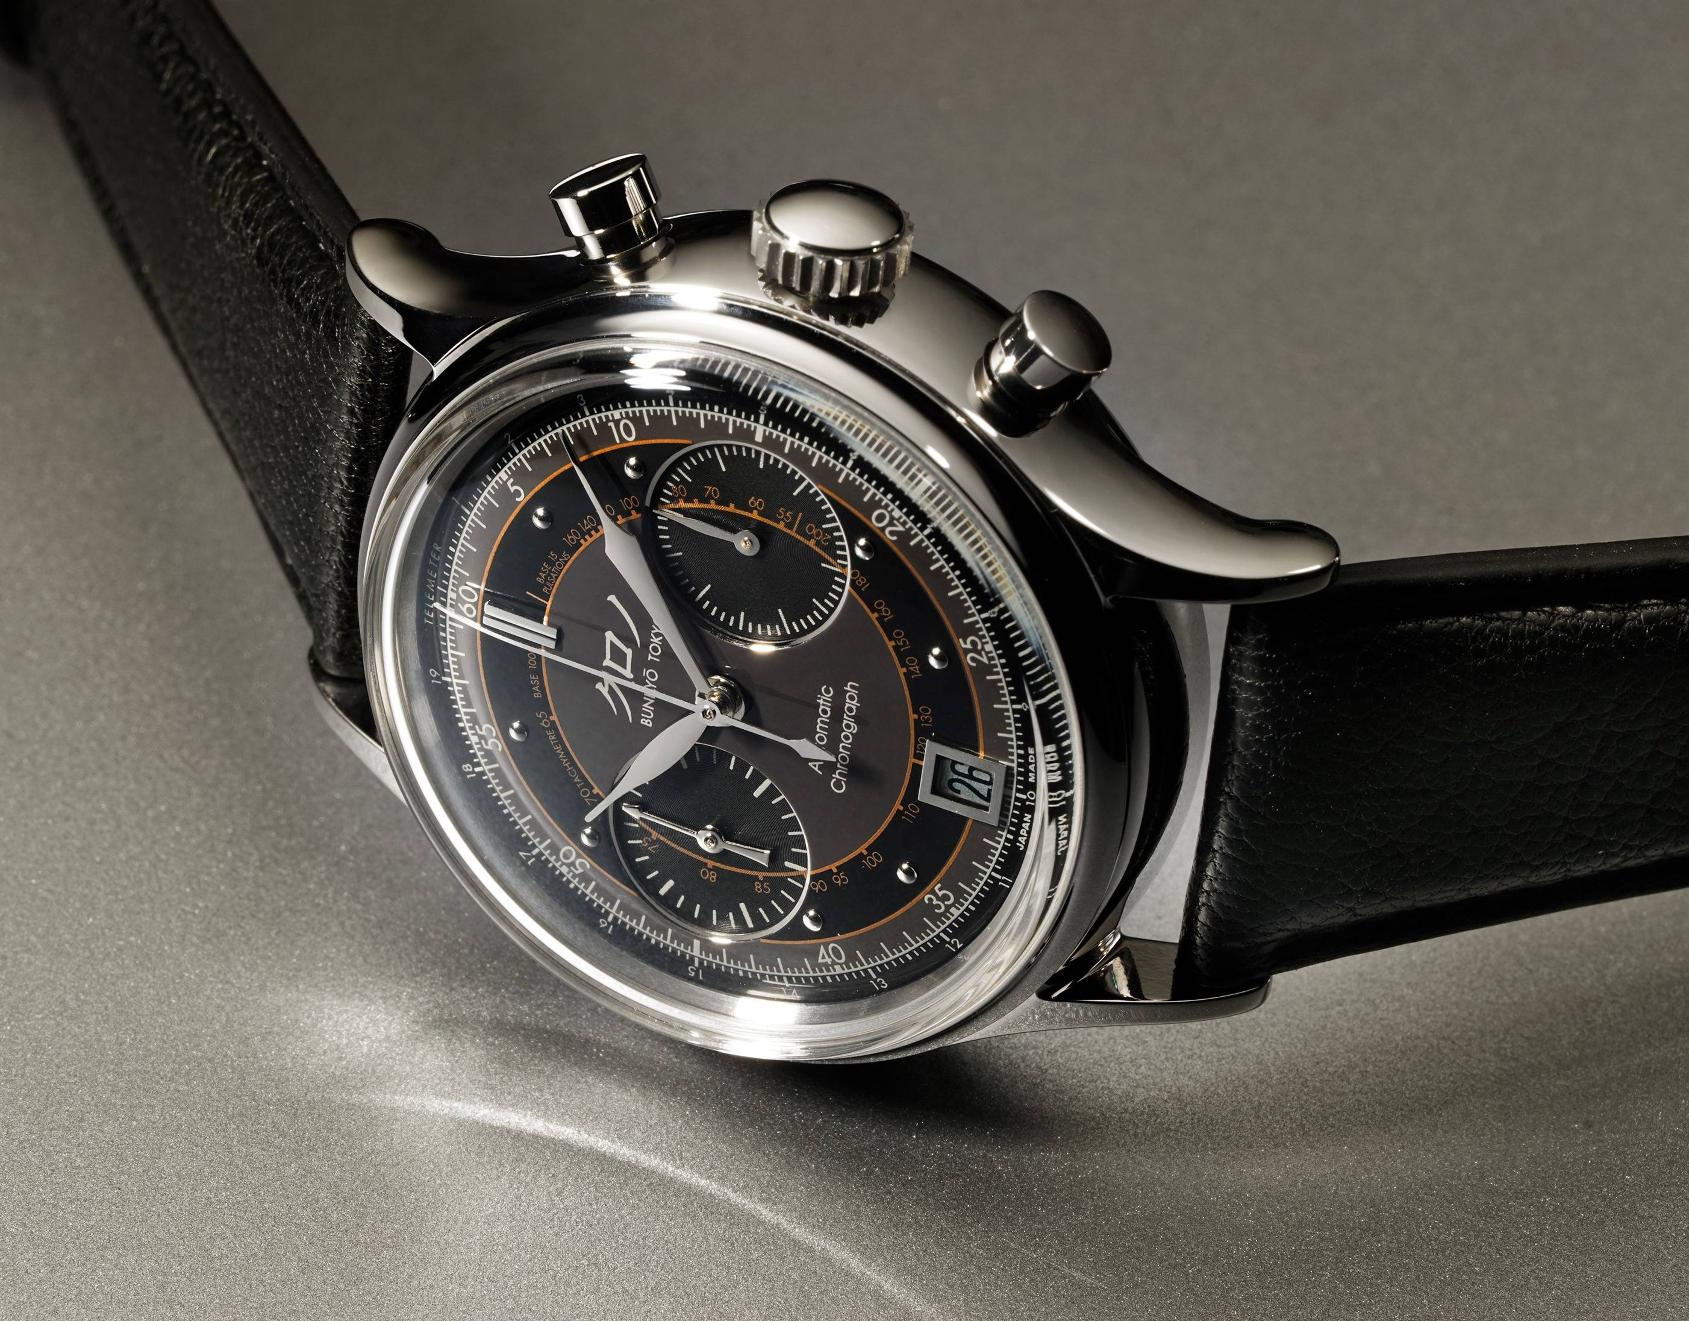 The best bicompax chronographs under $5000